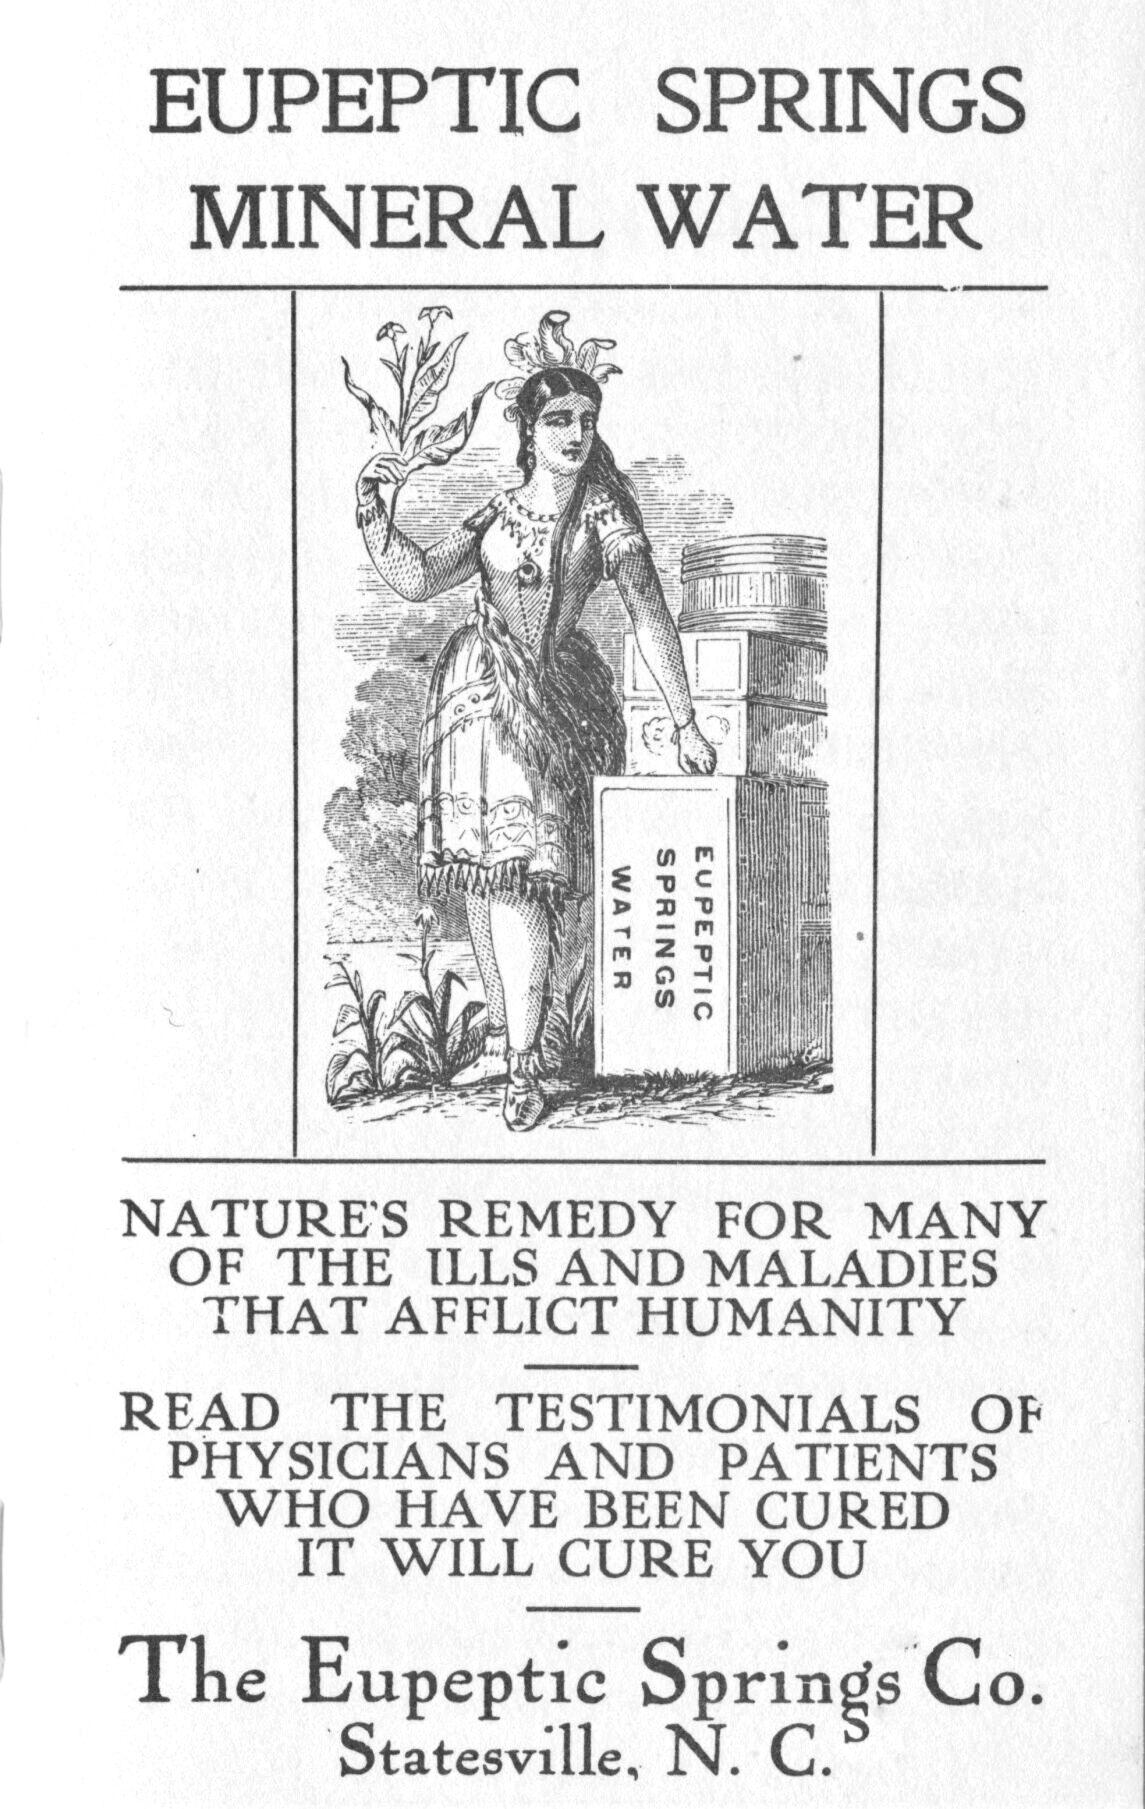 Eupeptic Spring ad, c. 1908.jpg